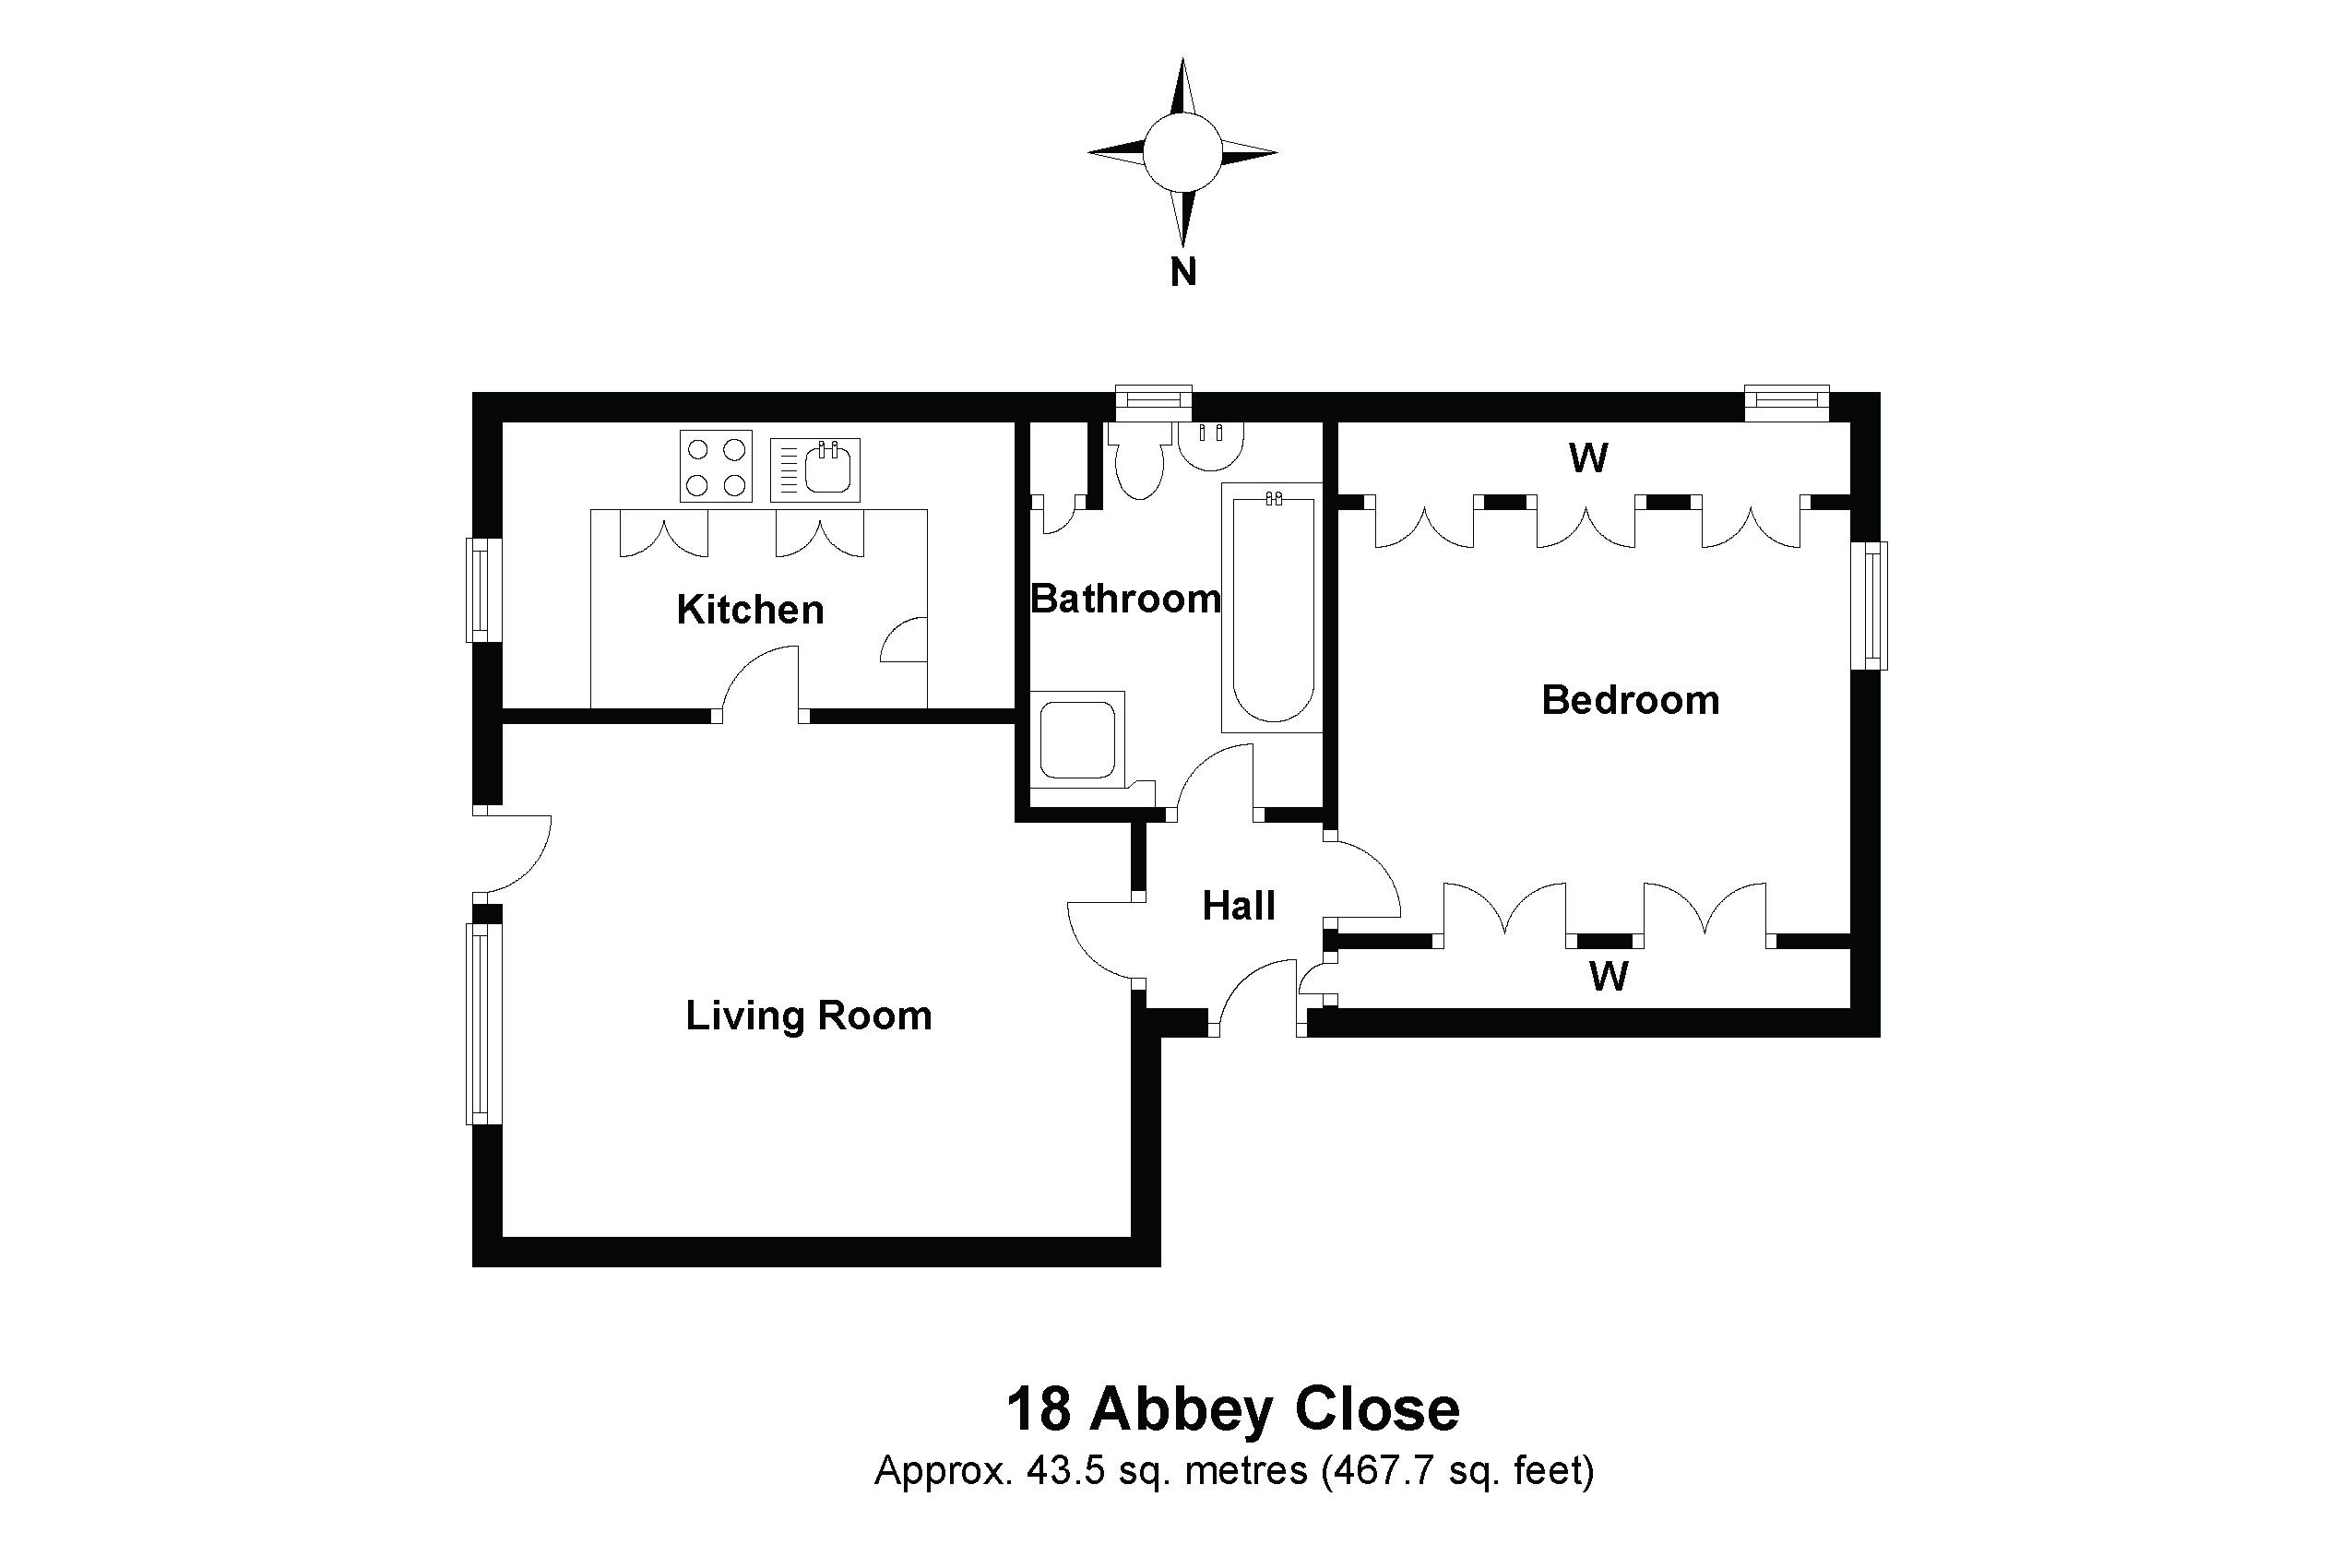 18 Abbey Close Floorplan